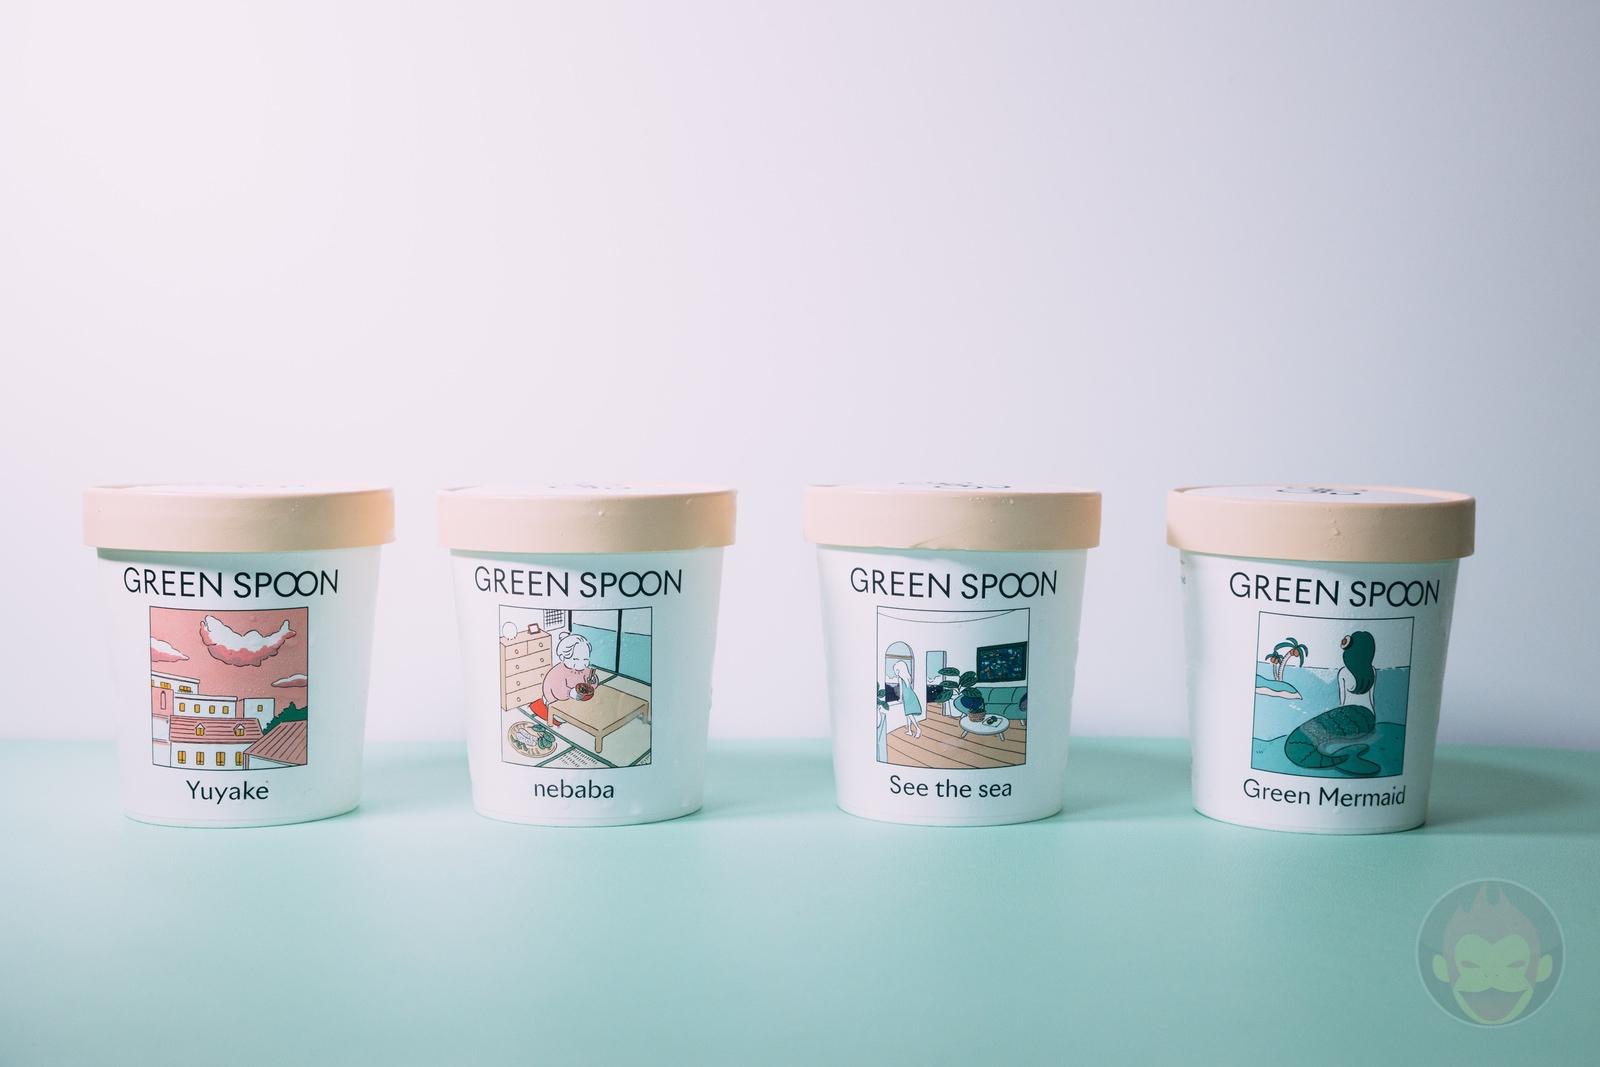 Green Spoon Soup wasa amazing 18